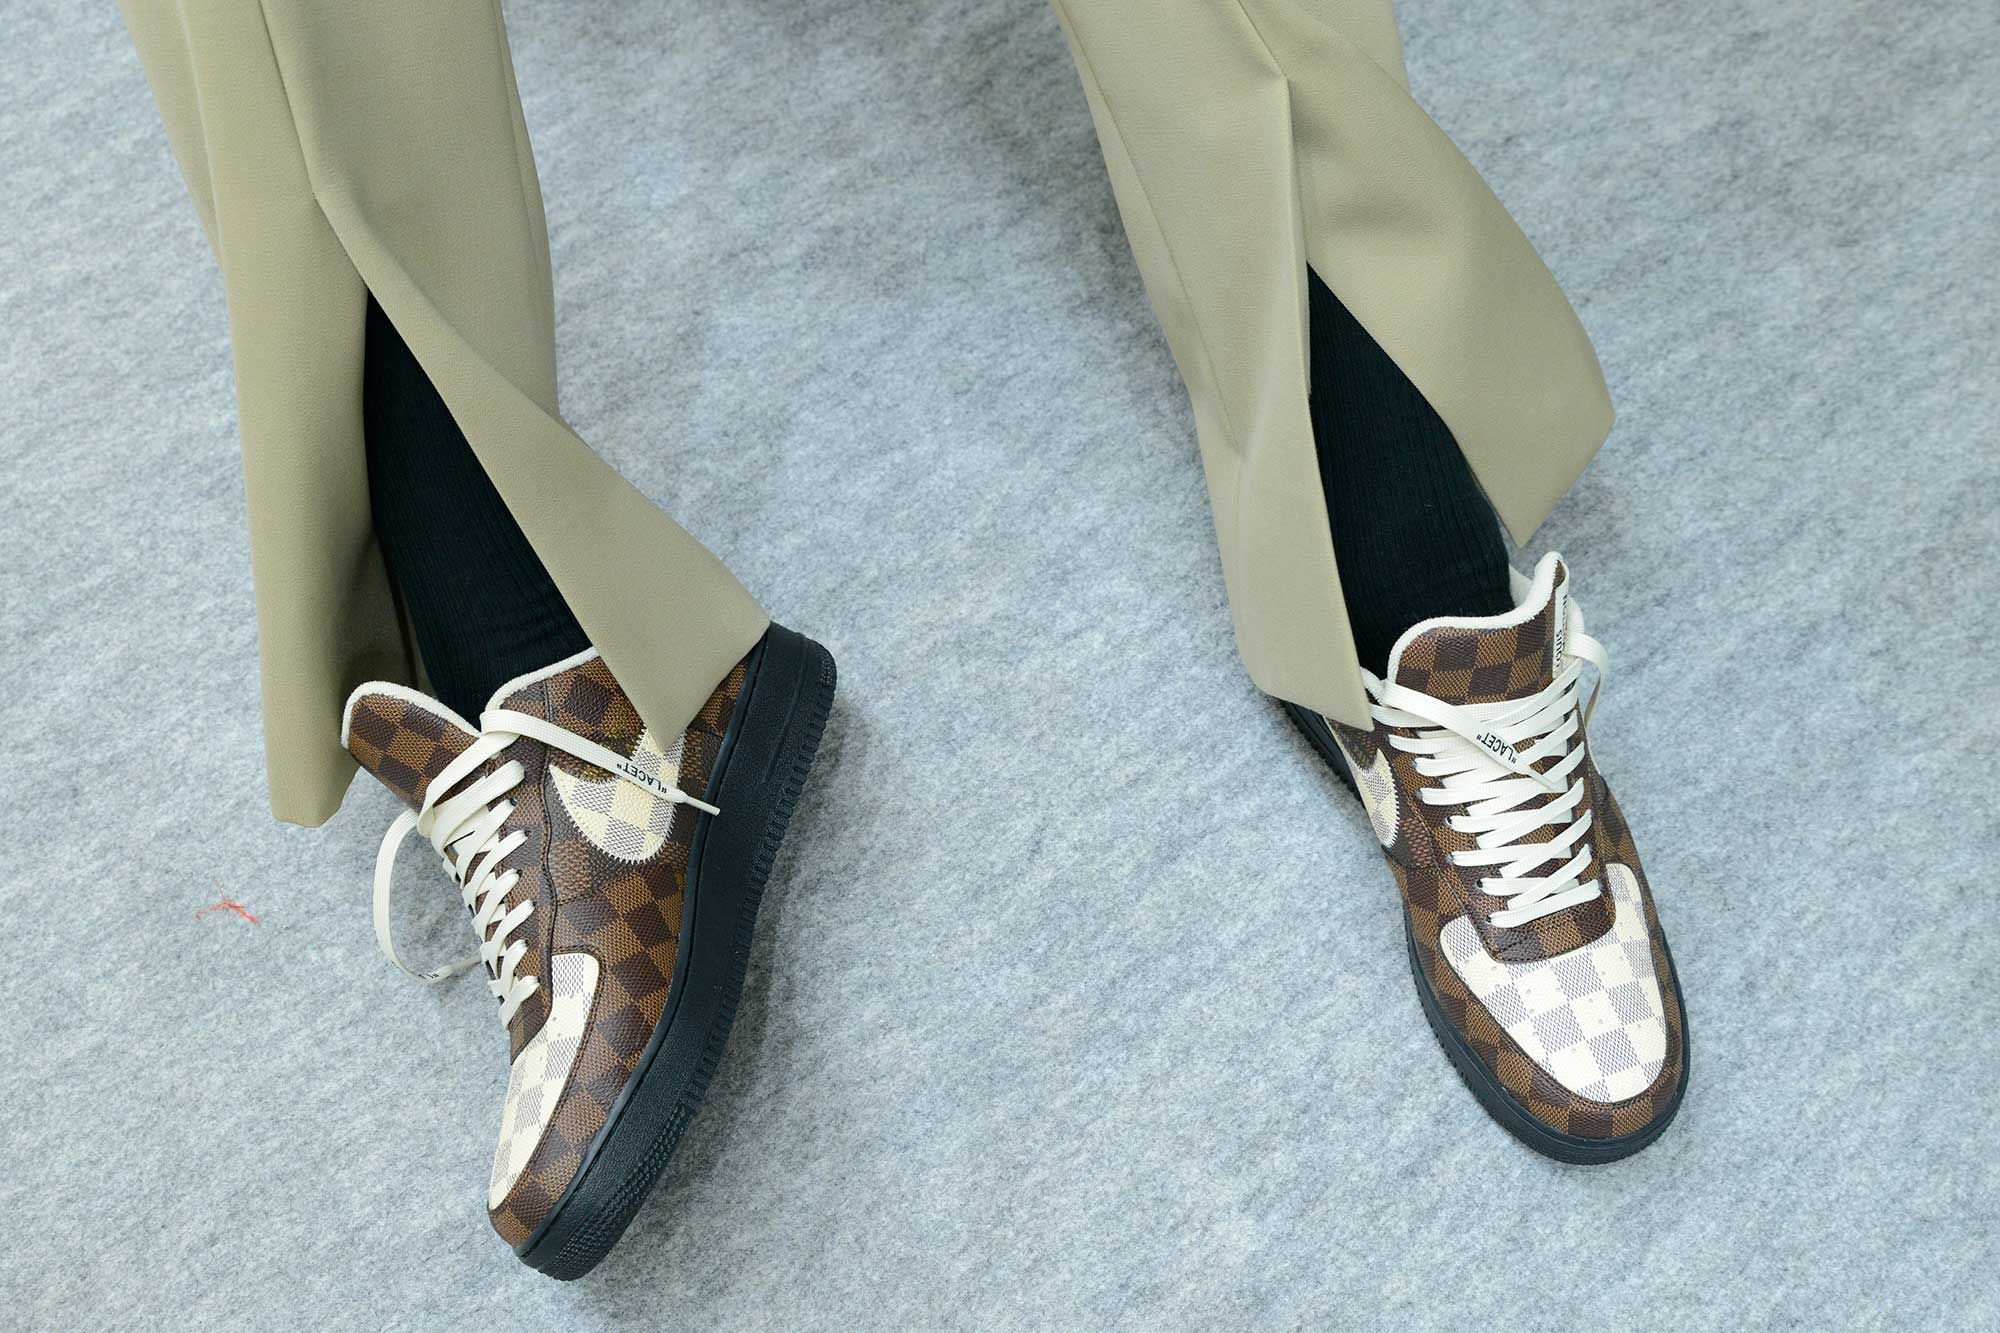 Louis Vuitton X Nike Air Force 1 Sneakers